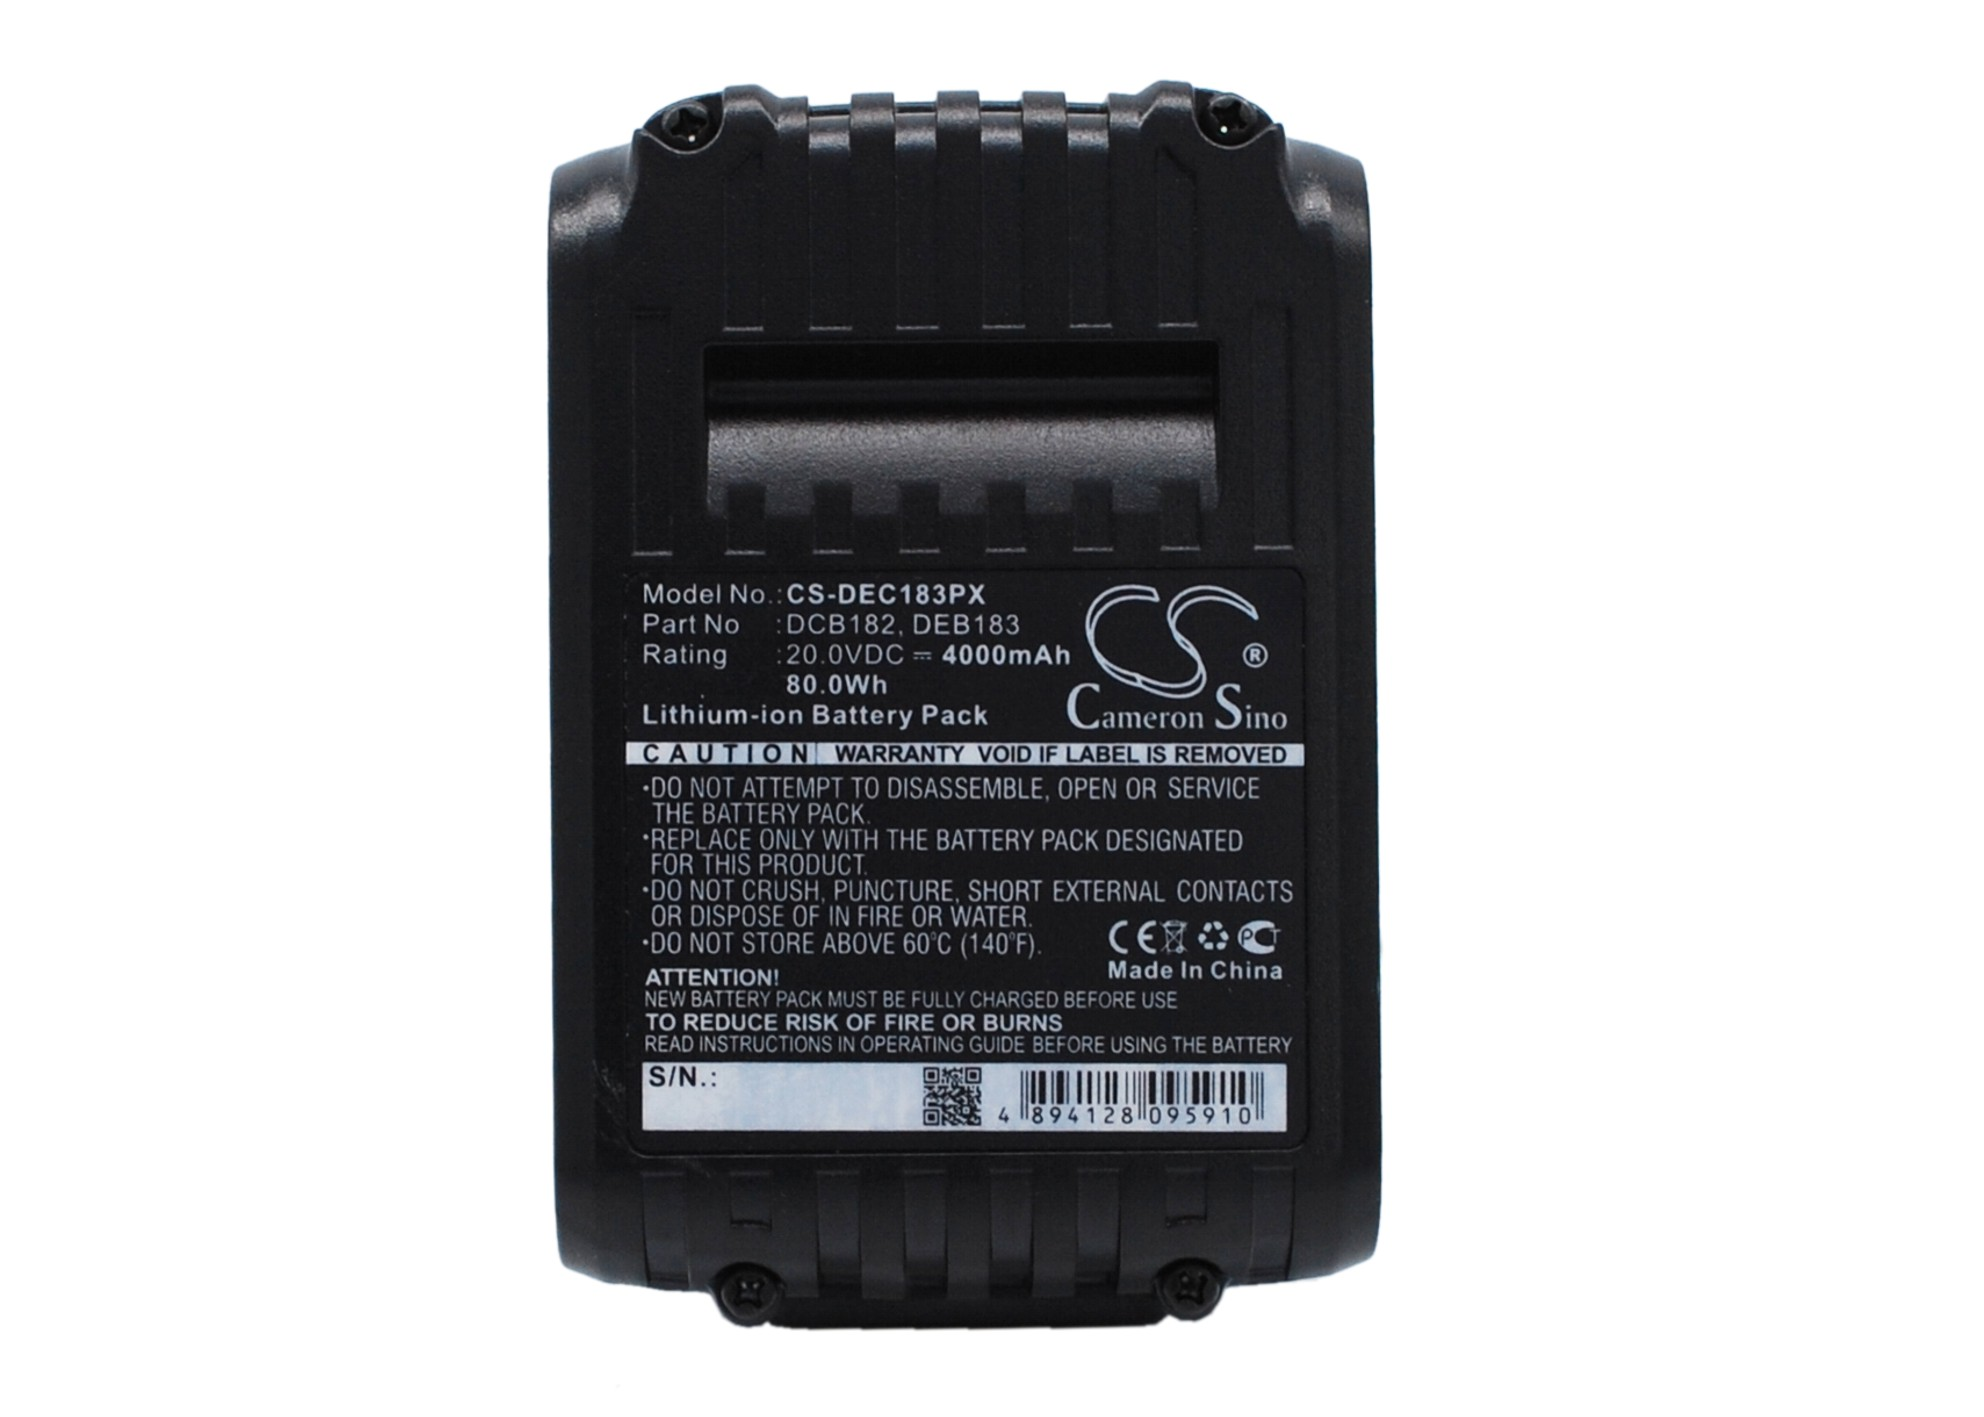 Cameron Sino baterie do nářadí pro DEWALT DCD780N 20V Li-ion 4000mAh černá - neoriginální